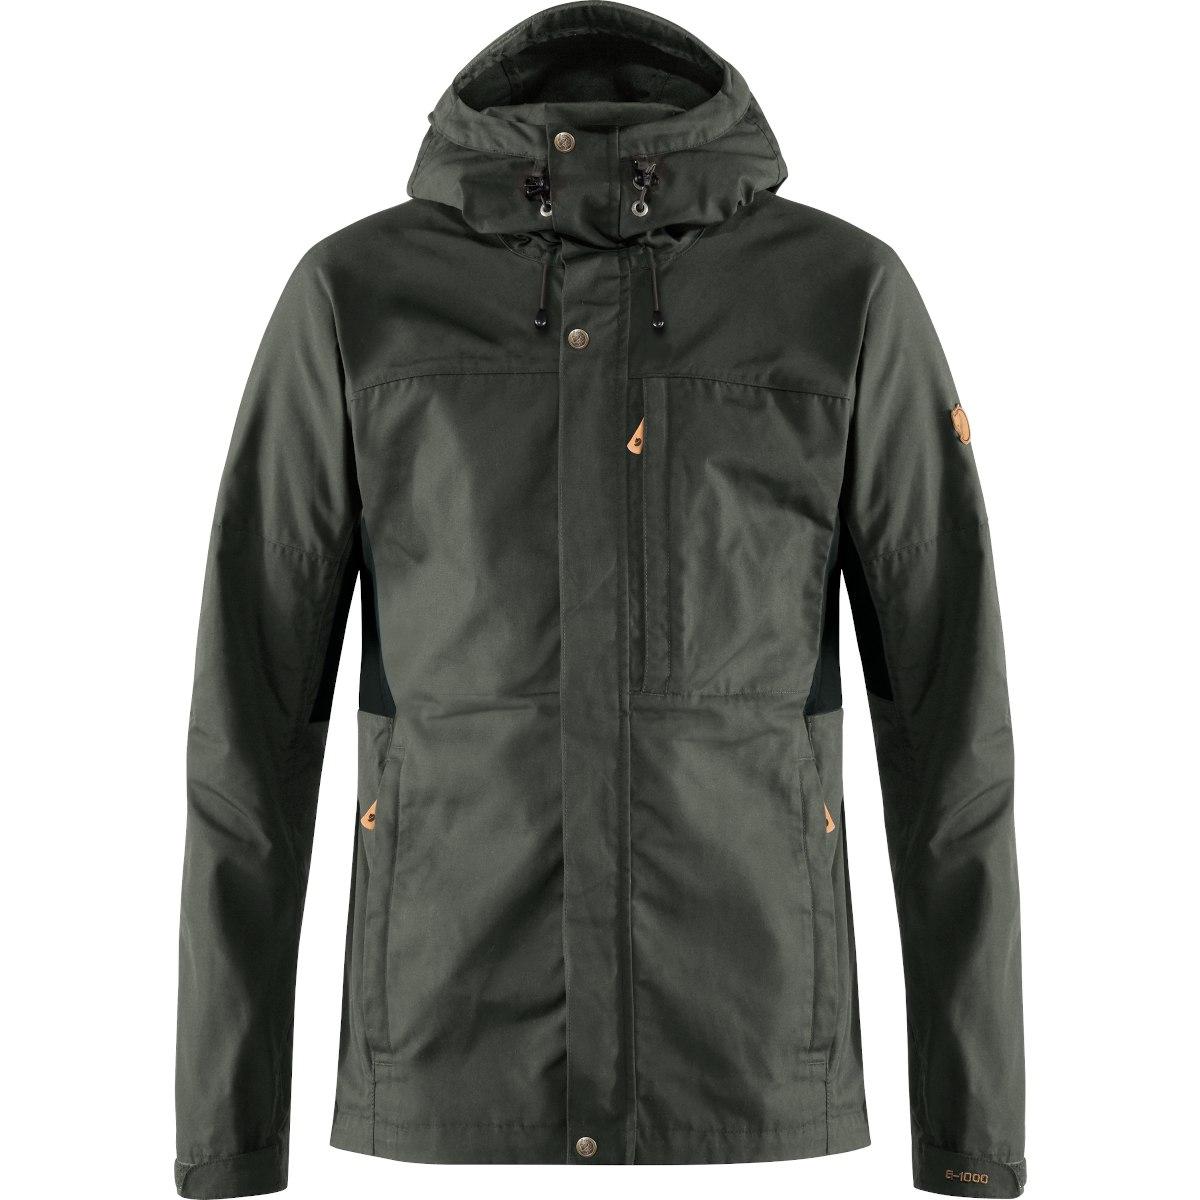 Fjällräven Kaipak Jacket - dark grey/black